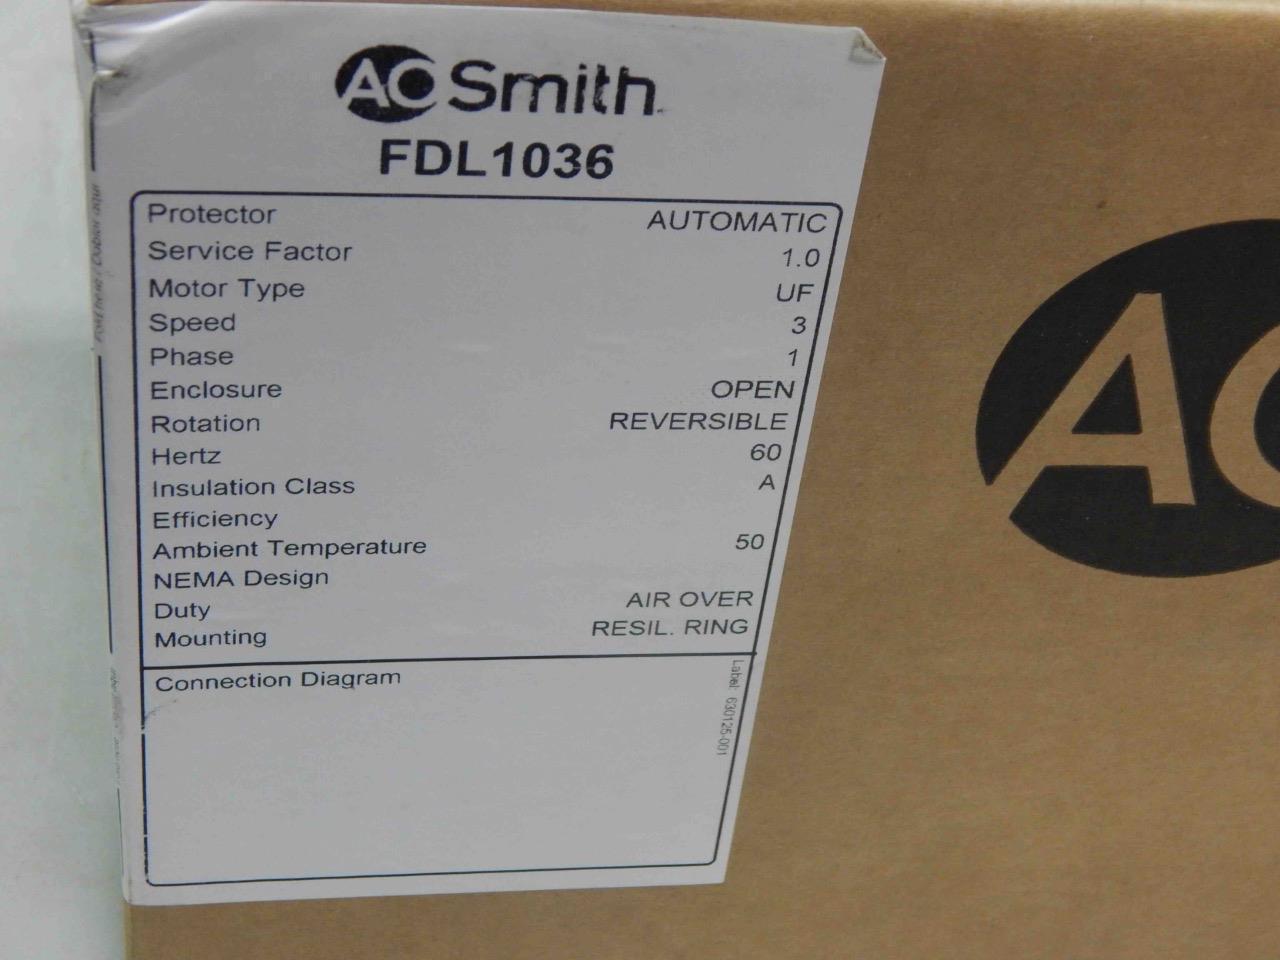 17 AO Smith Motor FDL1036 4MA66 13HP 115V RPM 10753 Spd 48Y Fr NEW 222065080584 3?resize\\\\\\\\\\\\\\\=665%2C499 ebm papst fan wiring diagram 115v gandul 45 77 79 119  at gsmx.co